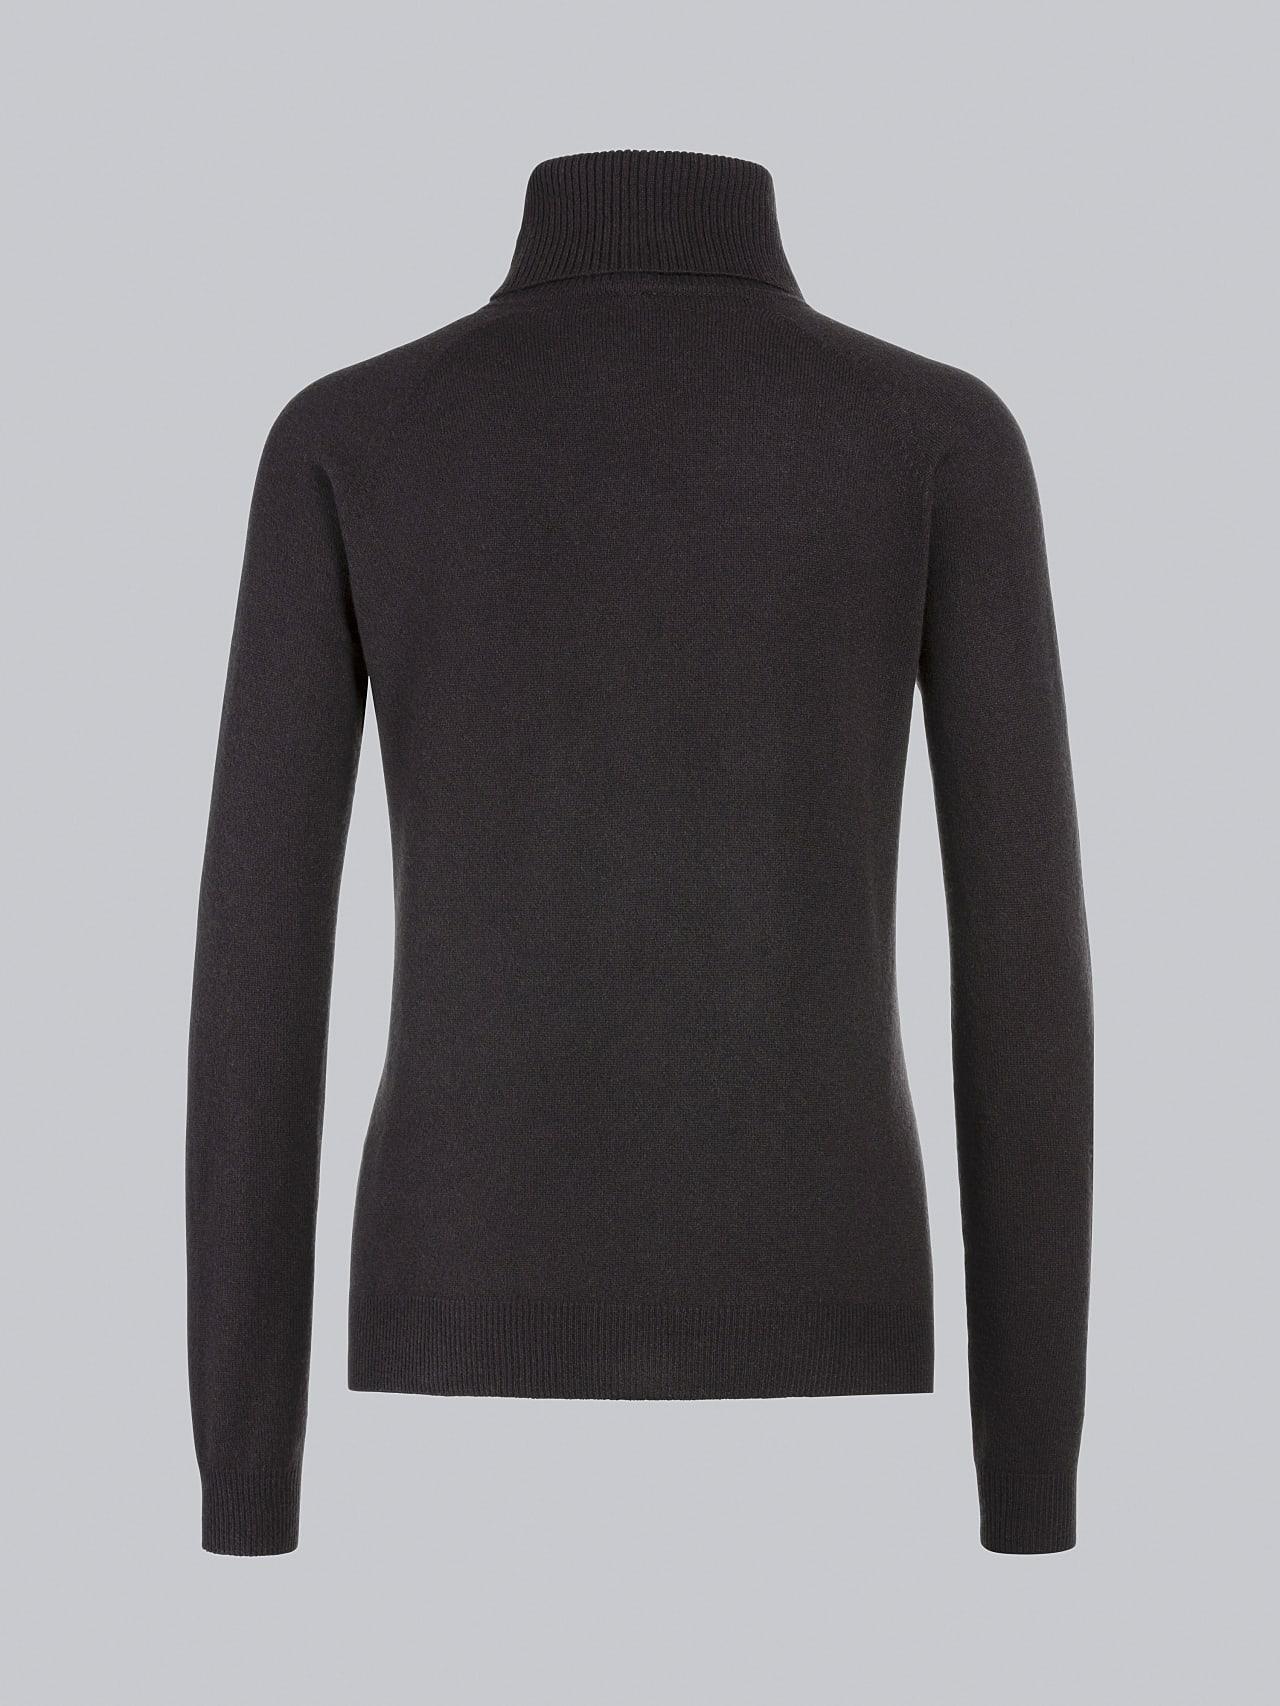 FLAMY V1.Y5.02 Seamless 3D Knit Merino-Cashmere Turtle Neck Burgundy Left Alpha Tauri